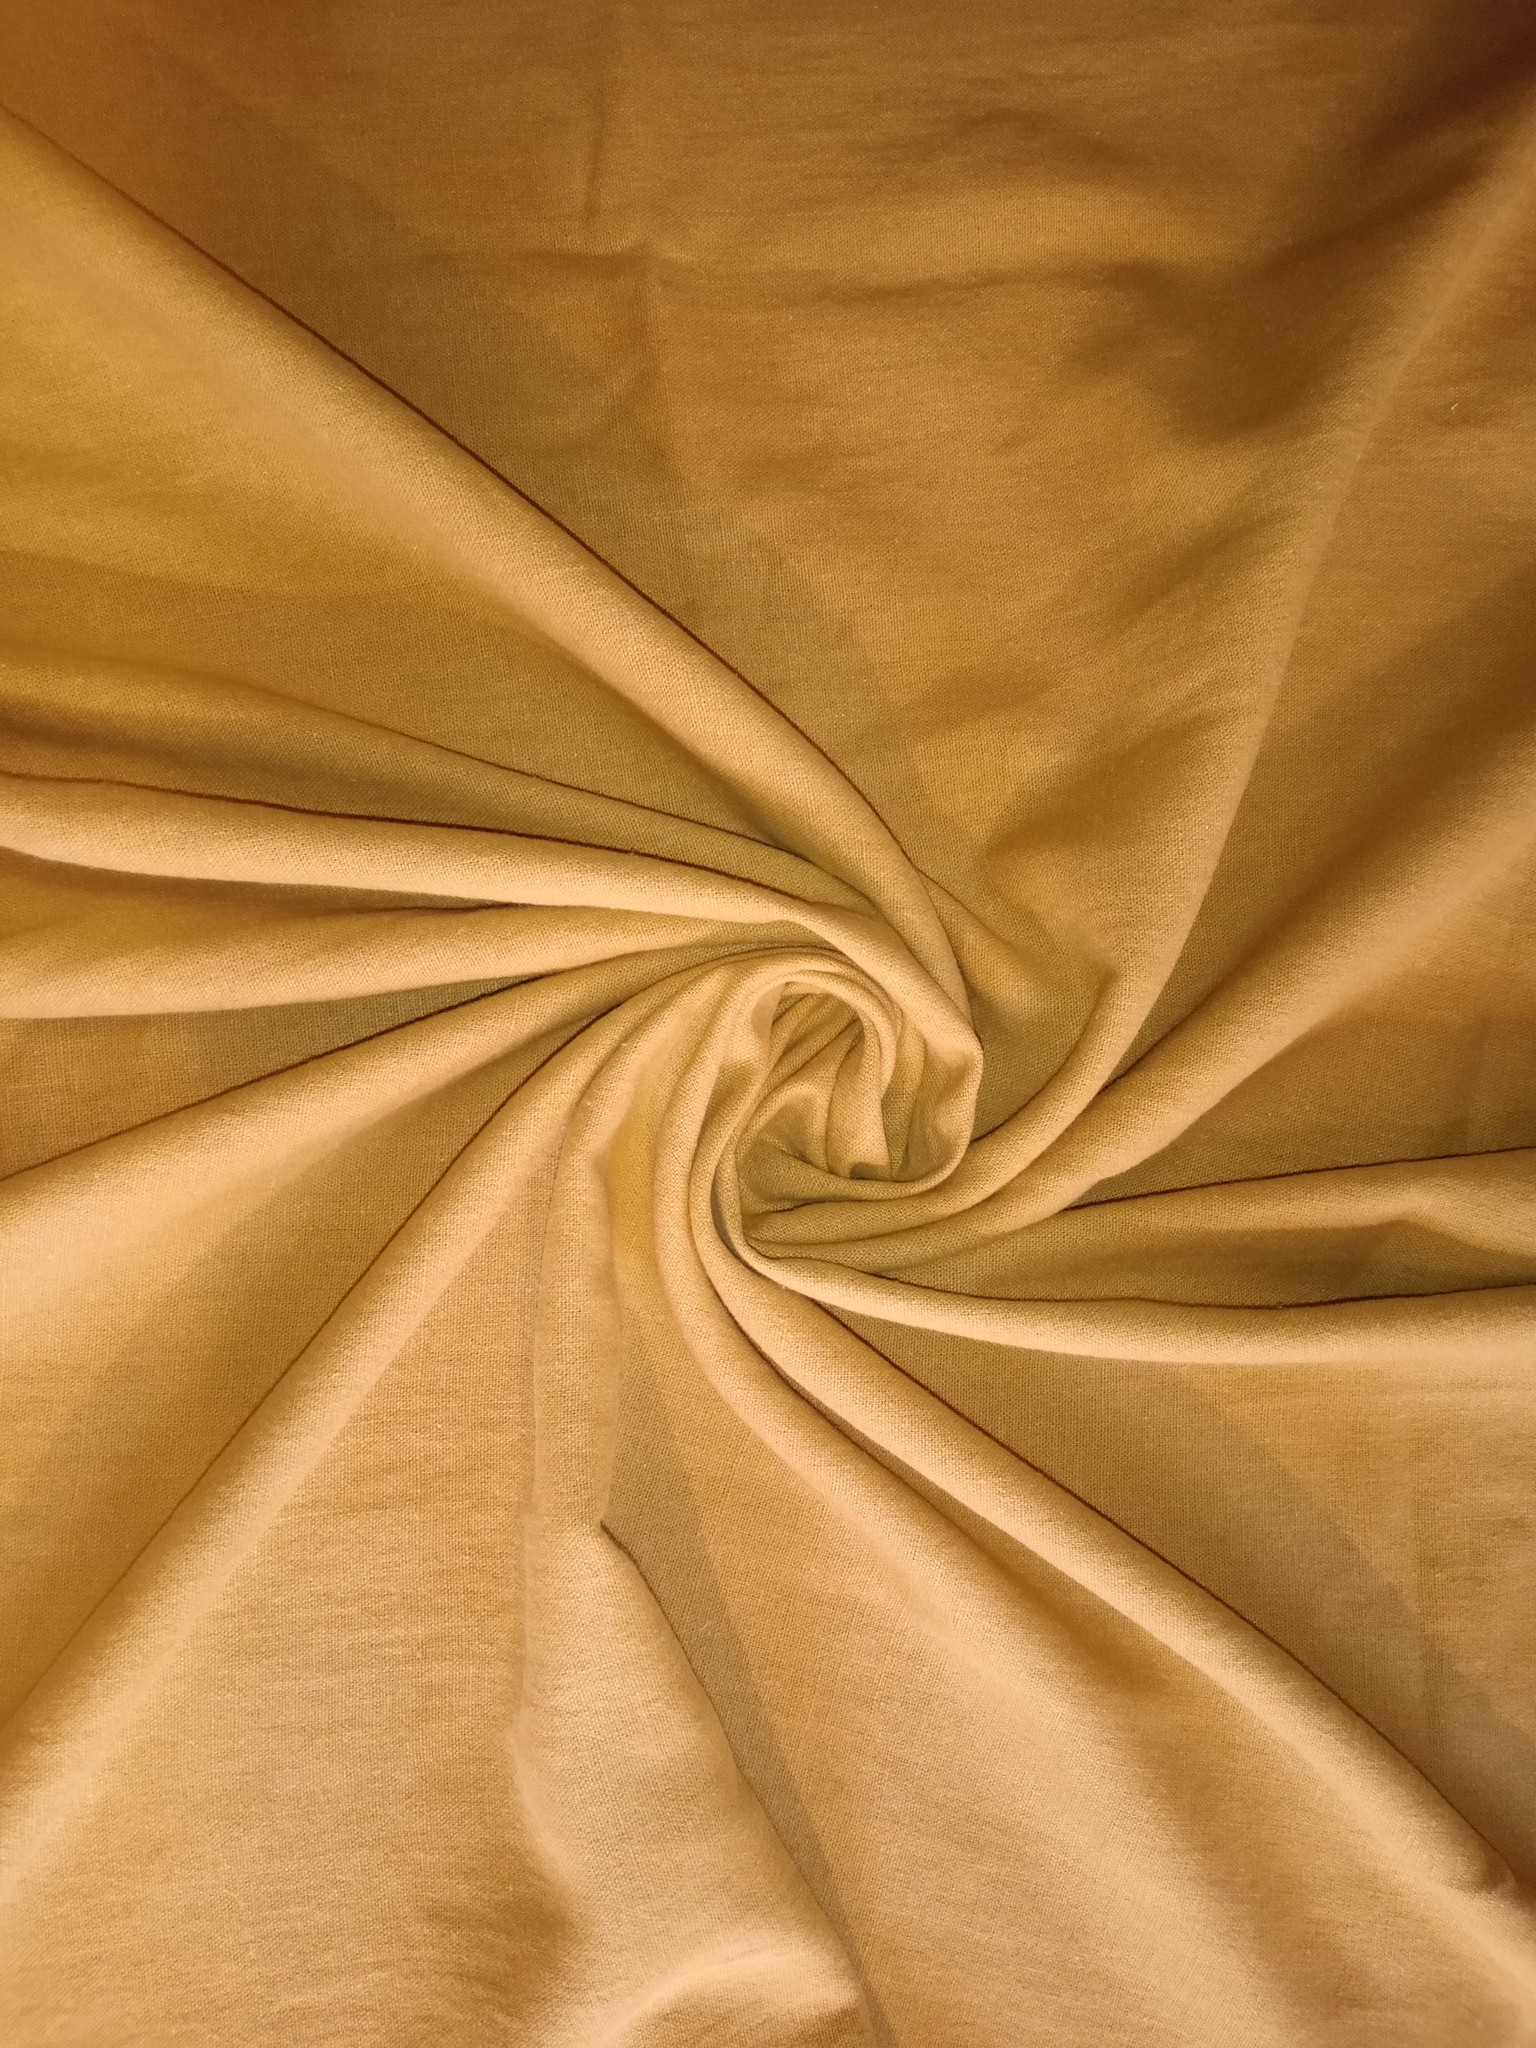 Tissu lin lavé moutarde  grande largeur